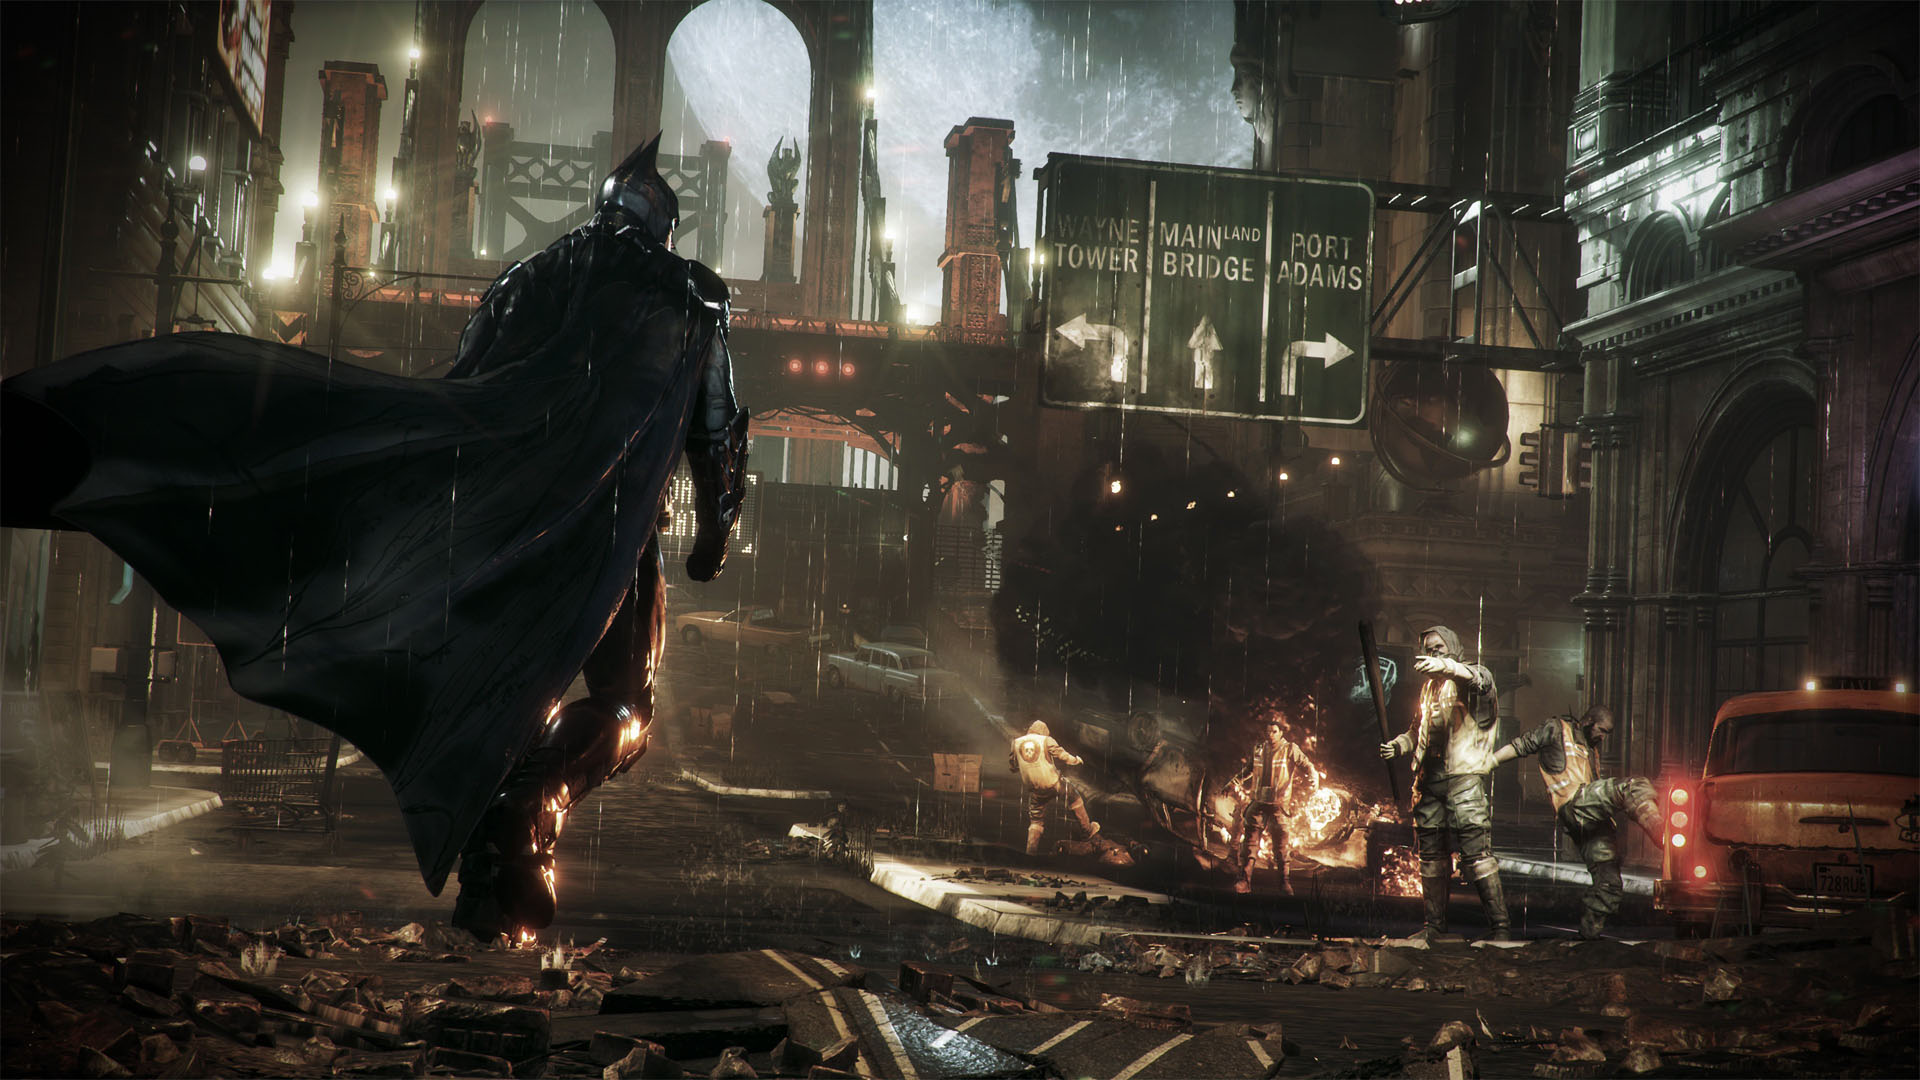 Download Batman Fight Scarecrow Arkham Knight HD Wallpaper Search 1920x1080